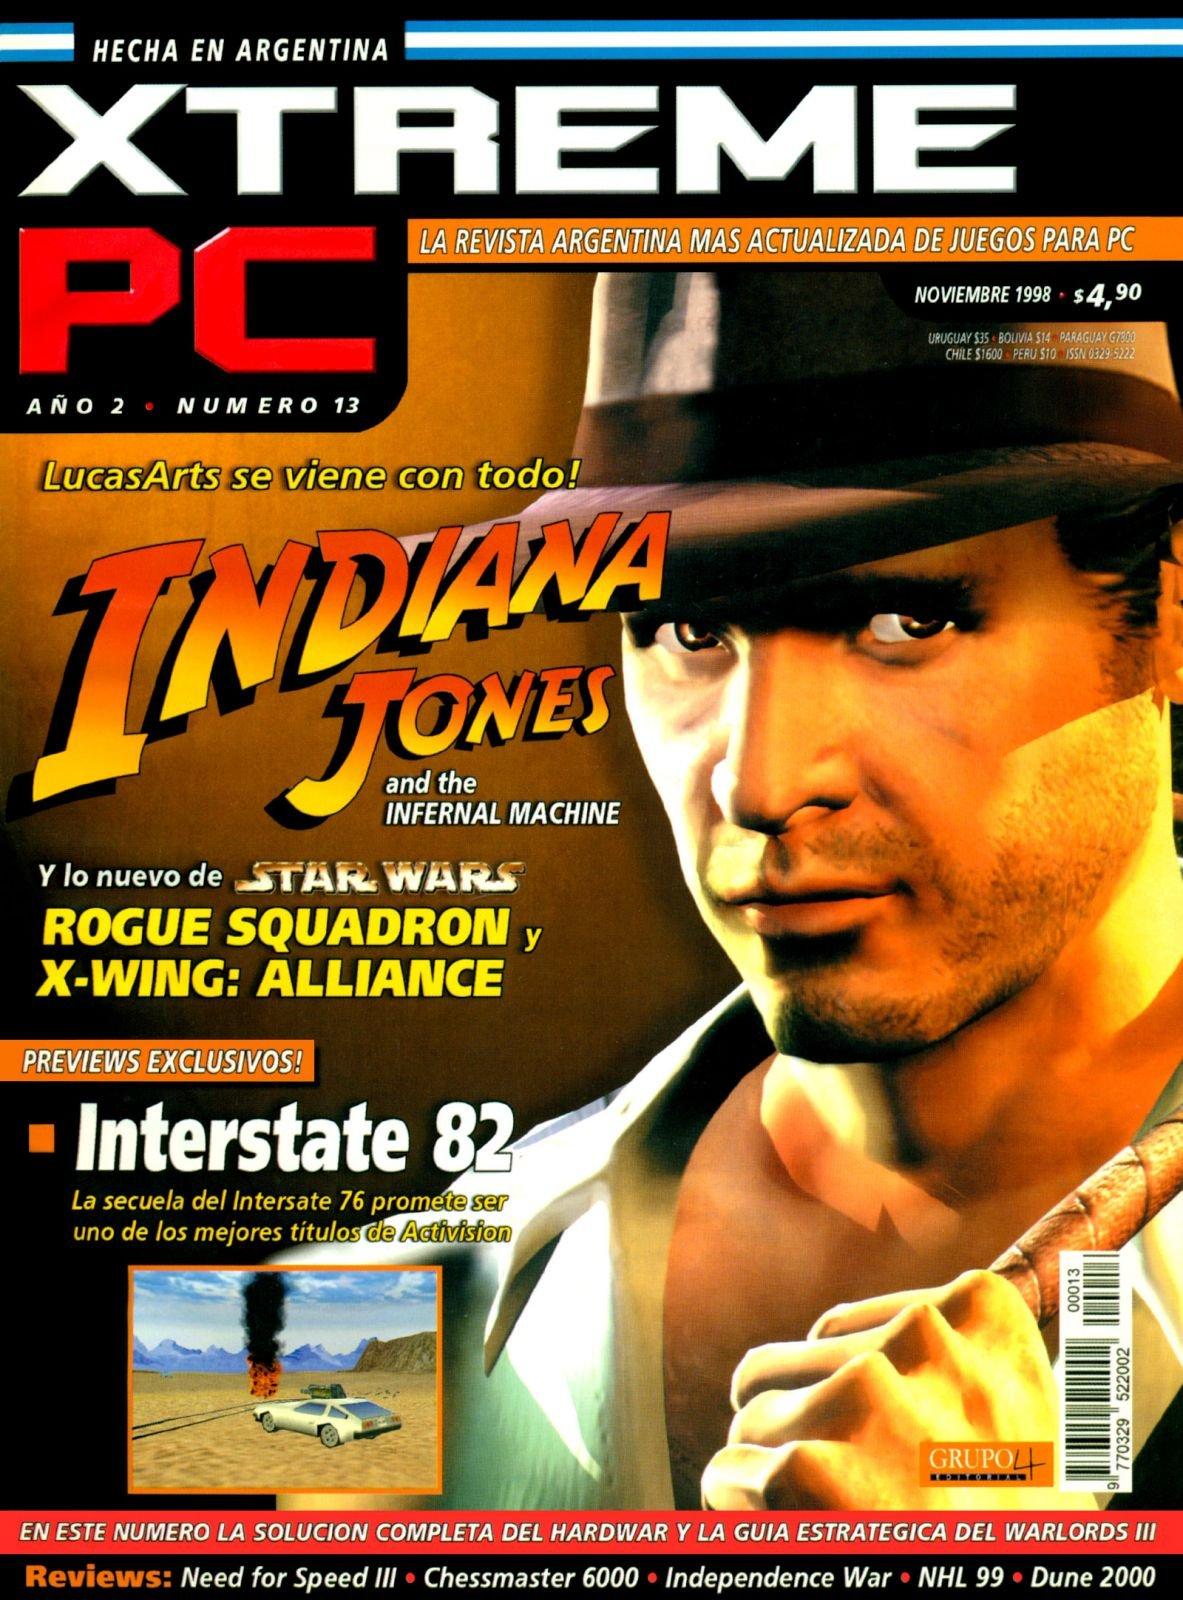 Xtreme PC 13 November 1998